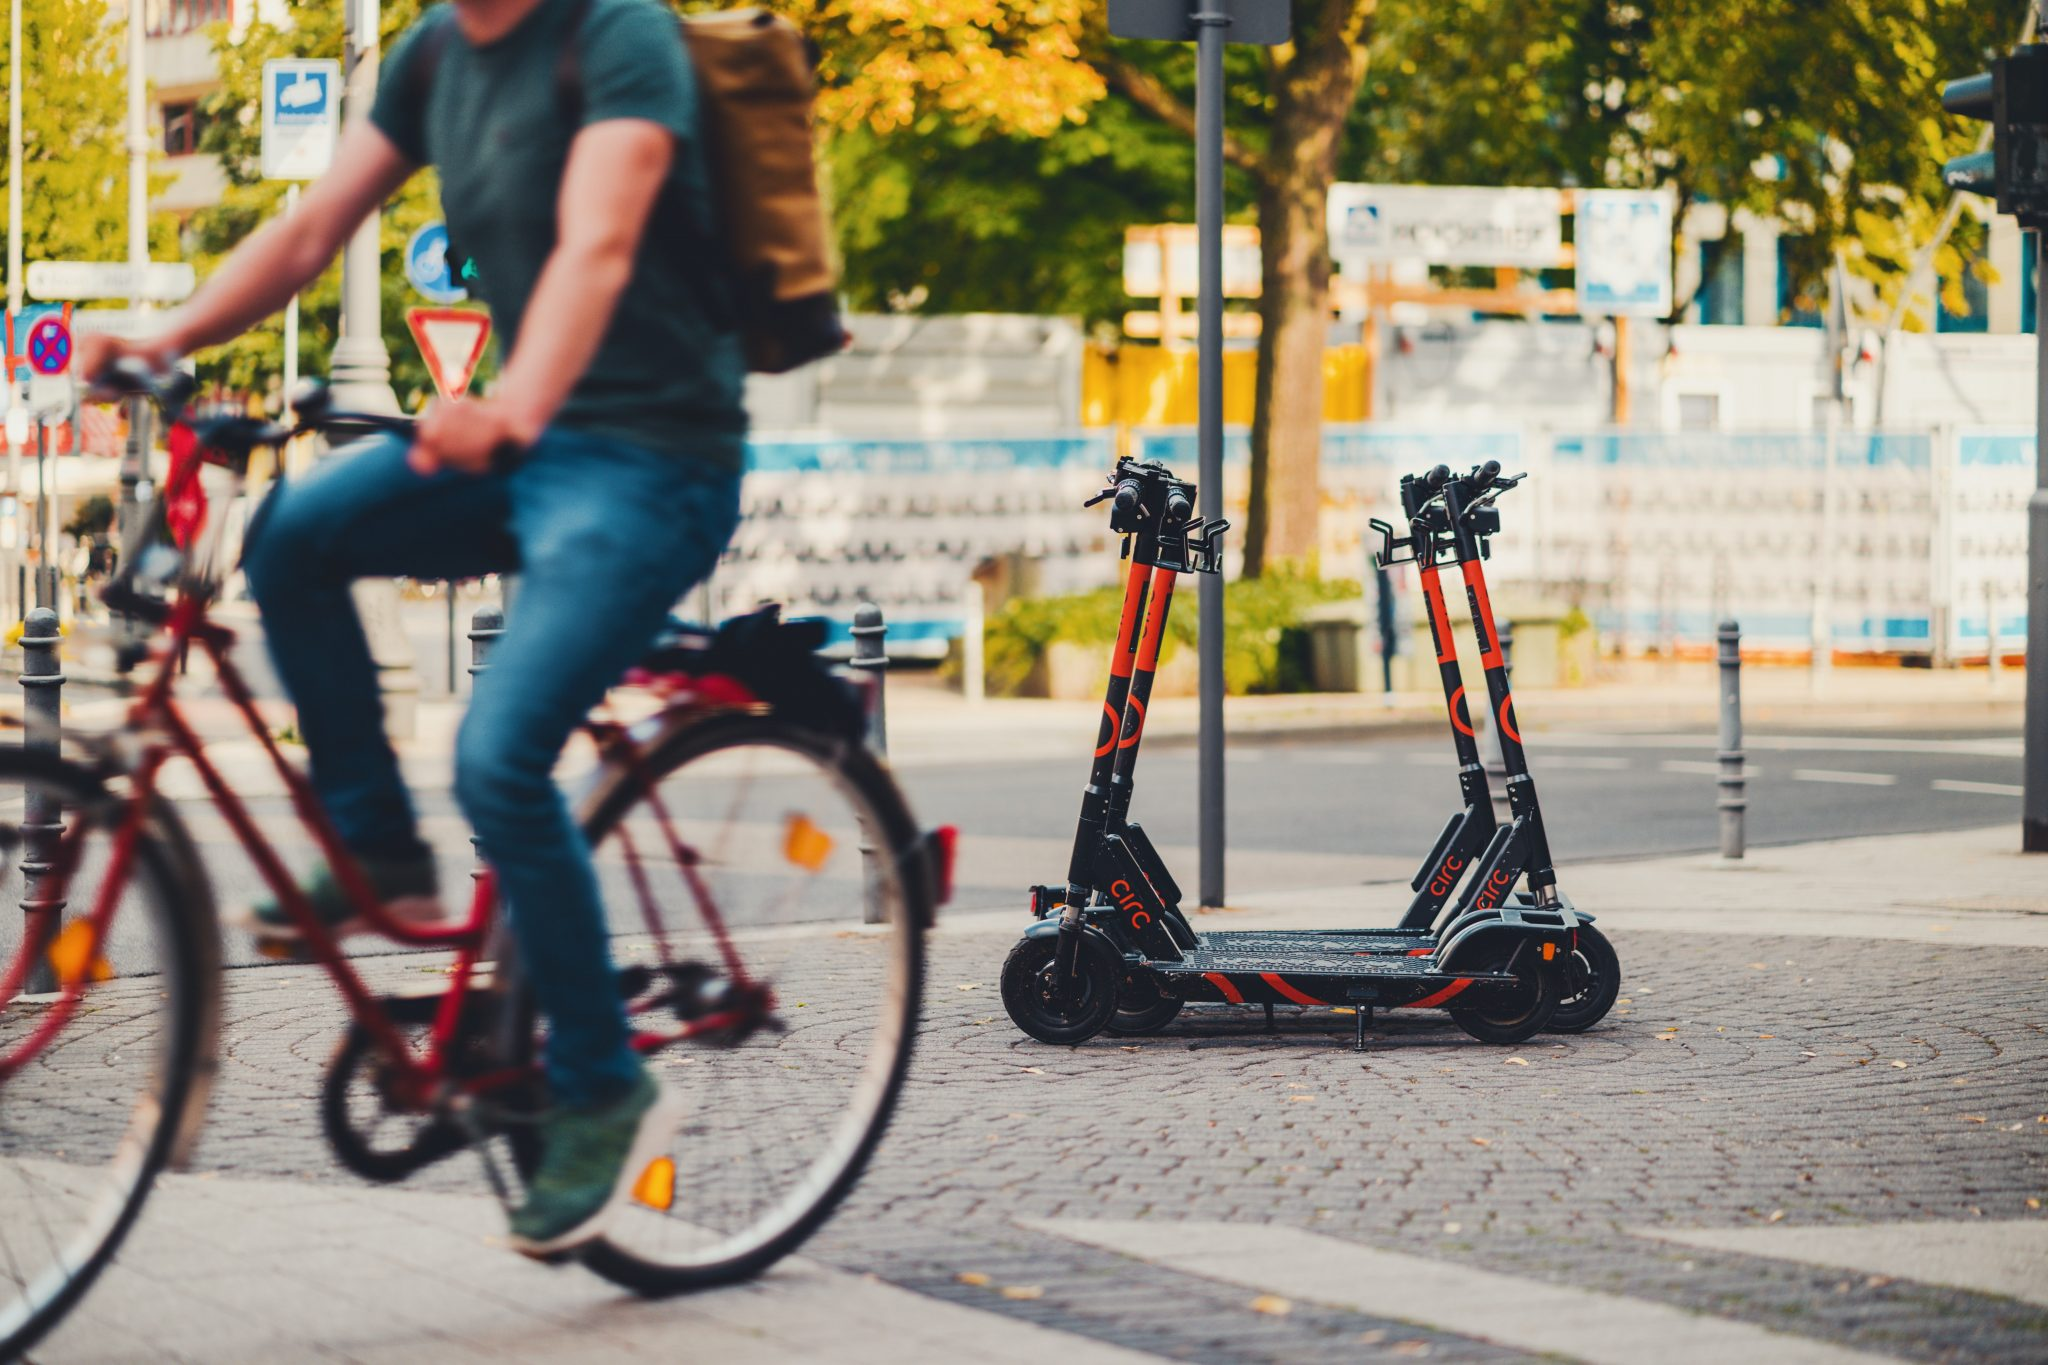 Il Mobility Manager Dirittoconsenso